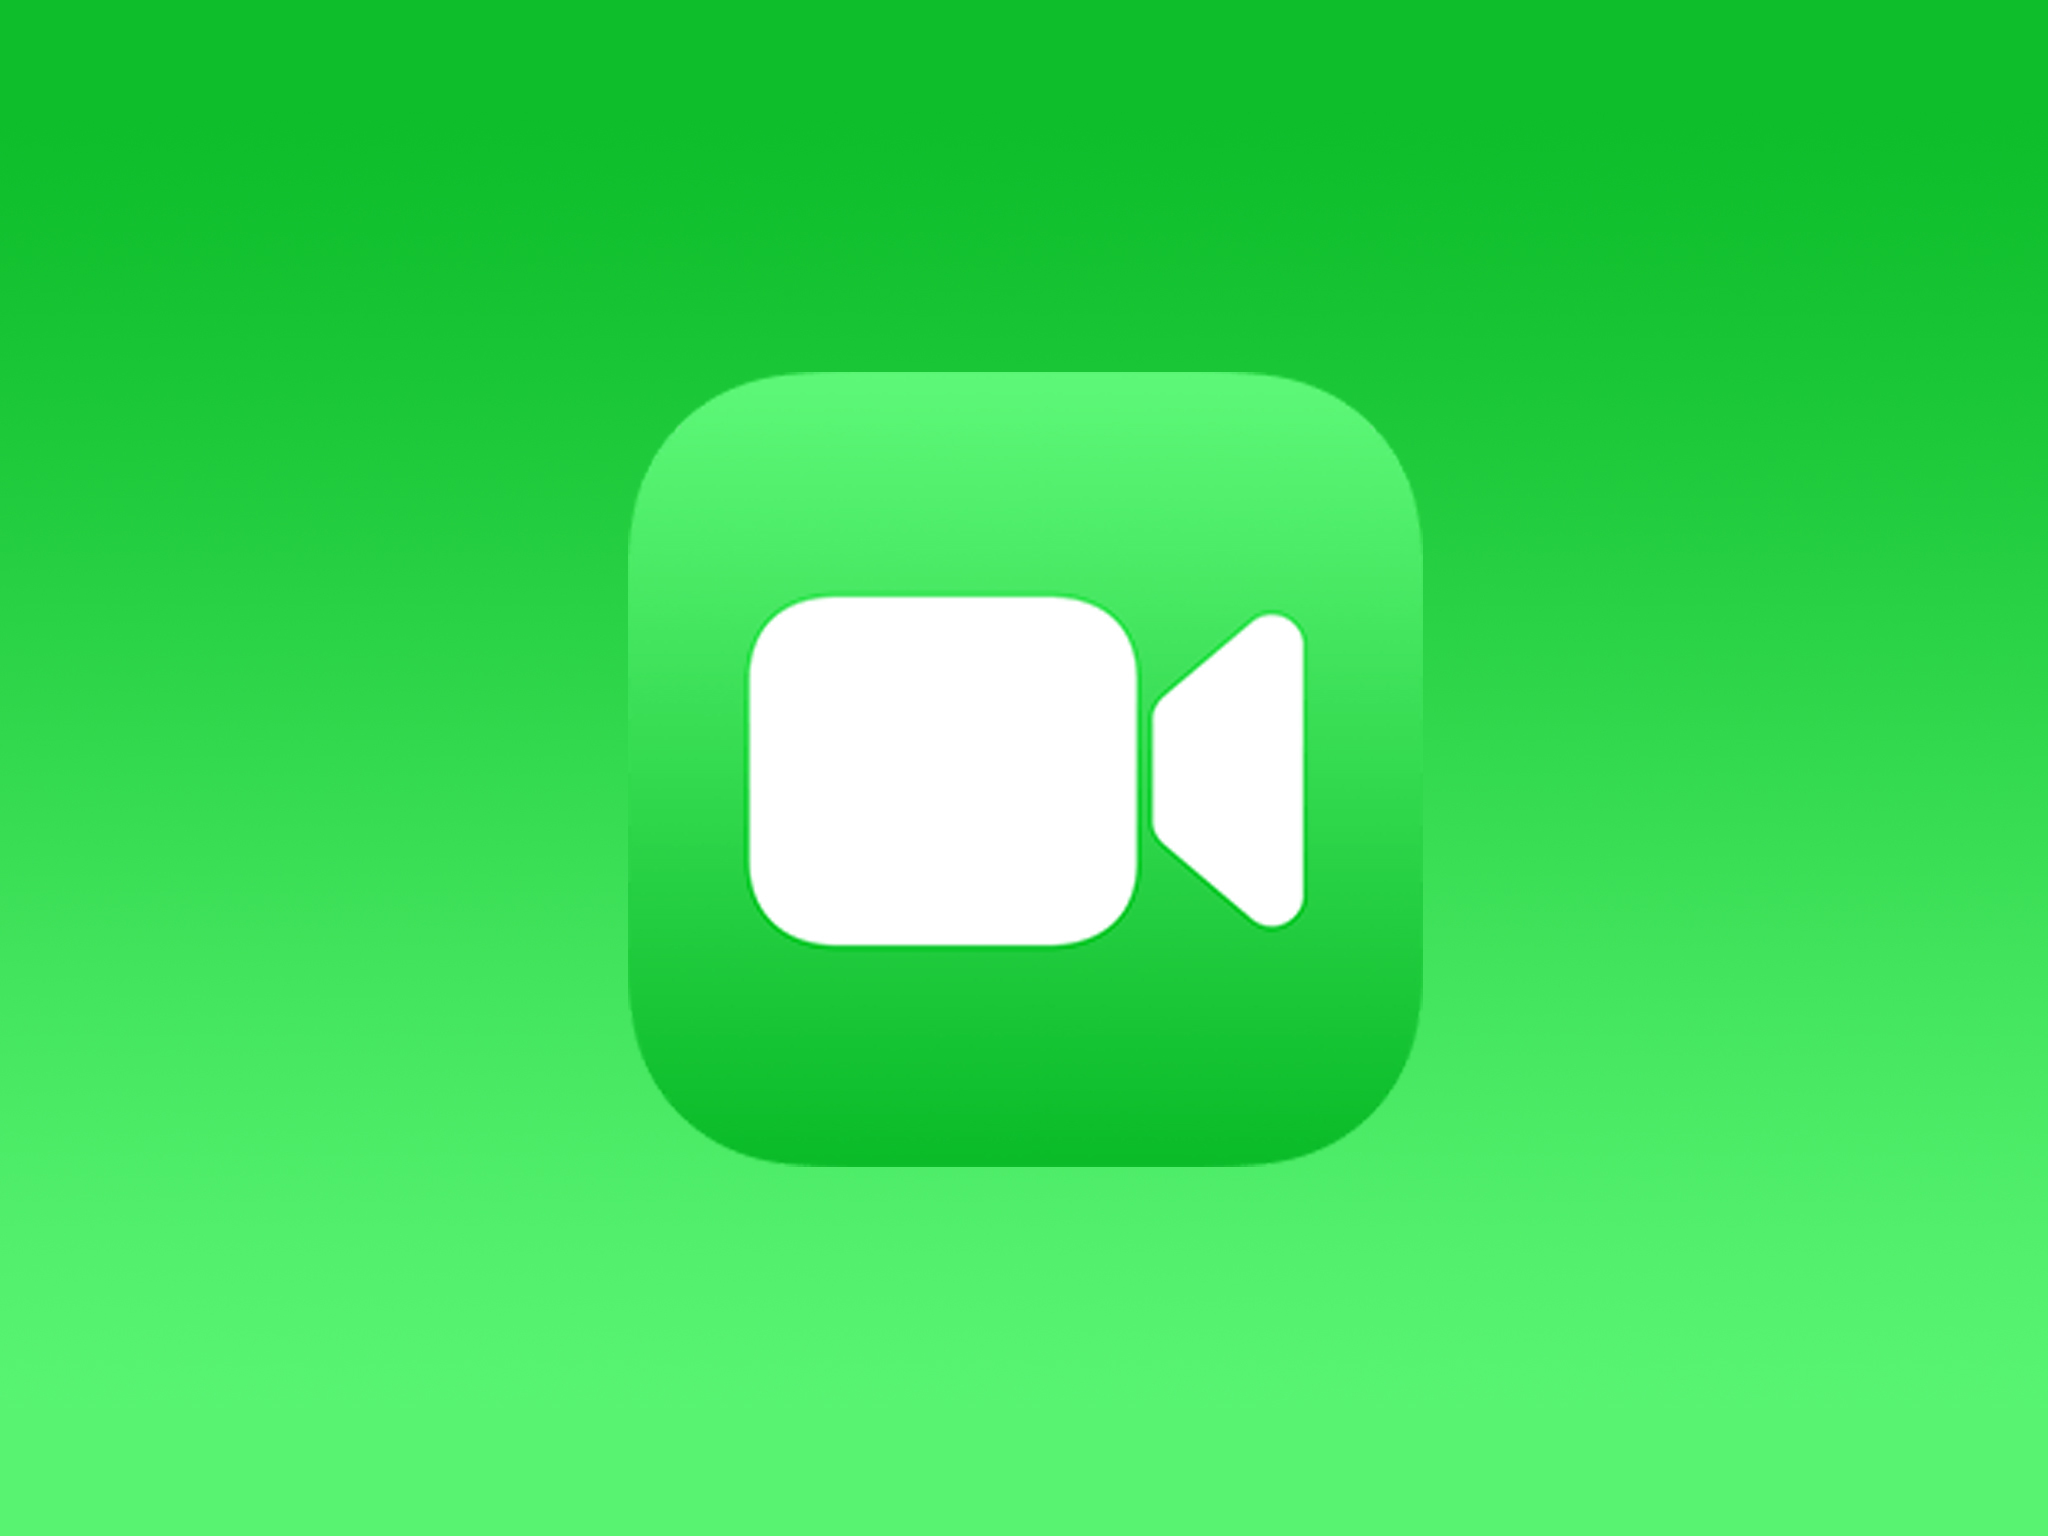 Apple FaceTime video chat app logo